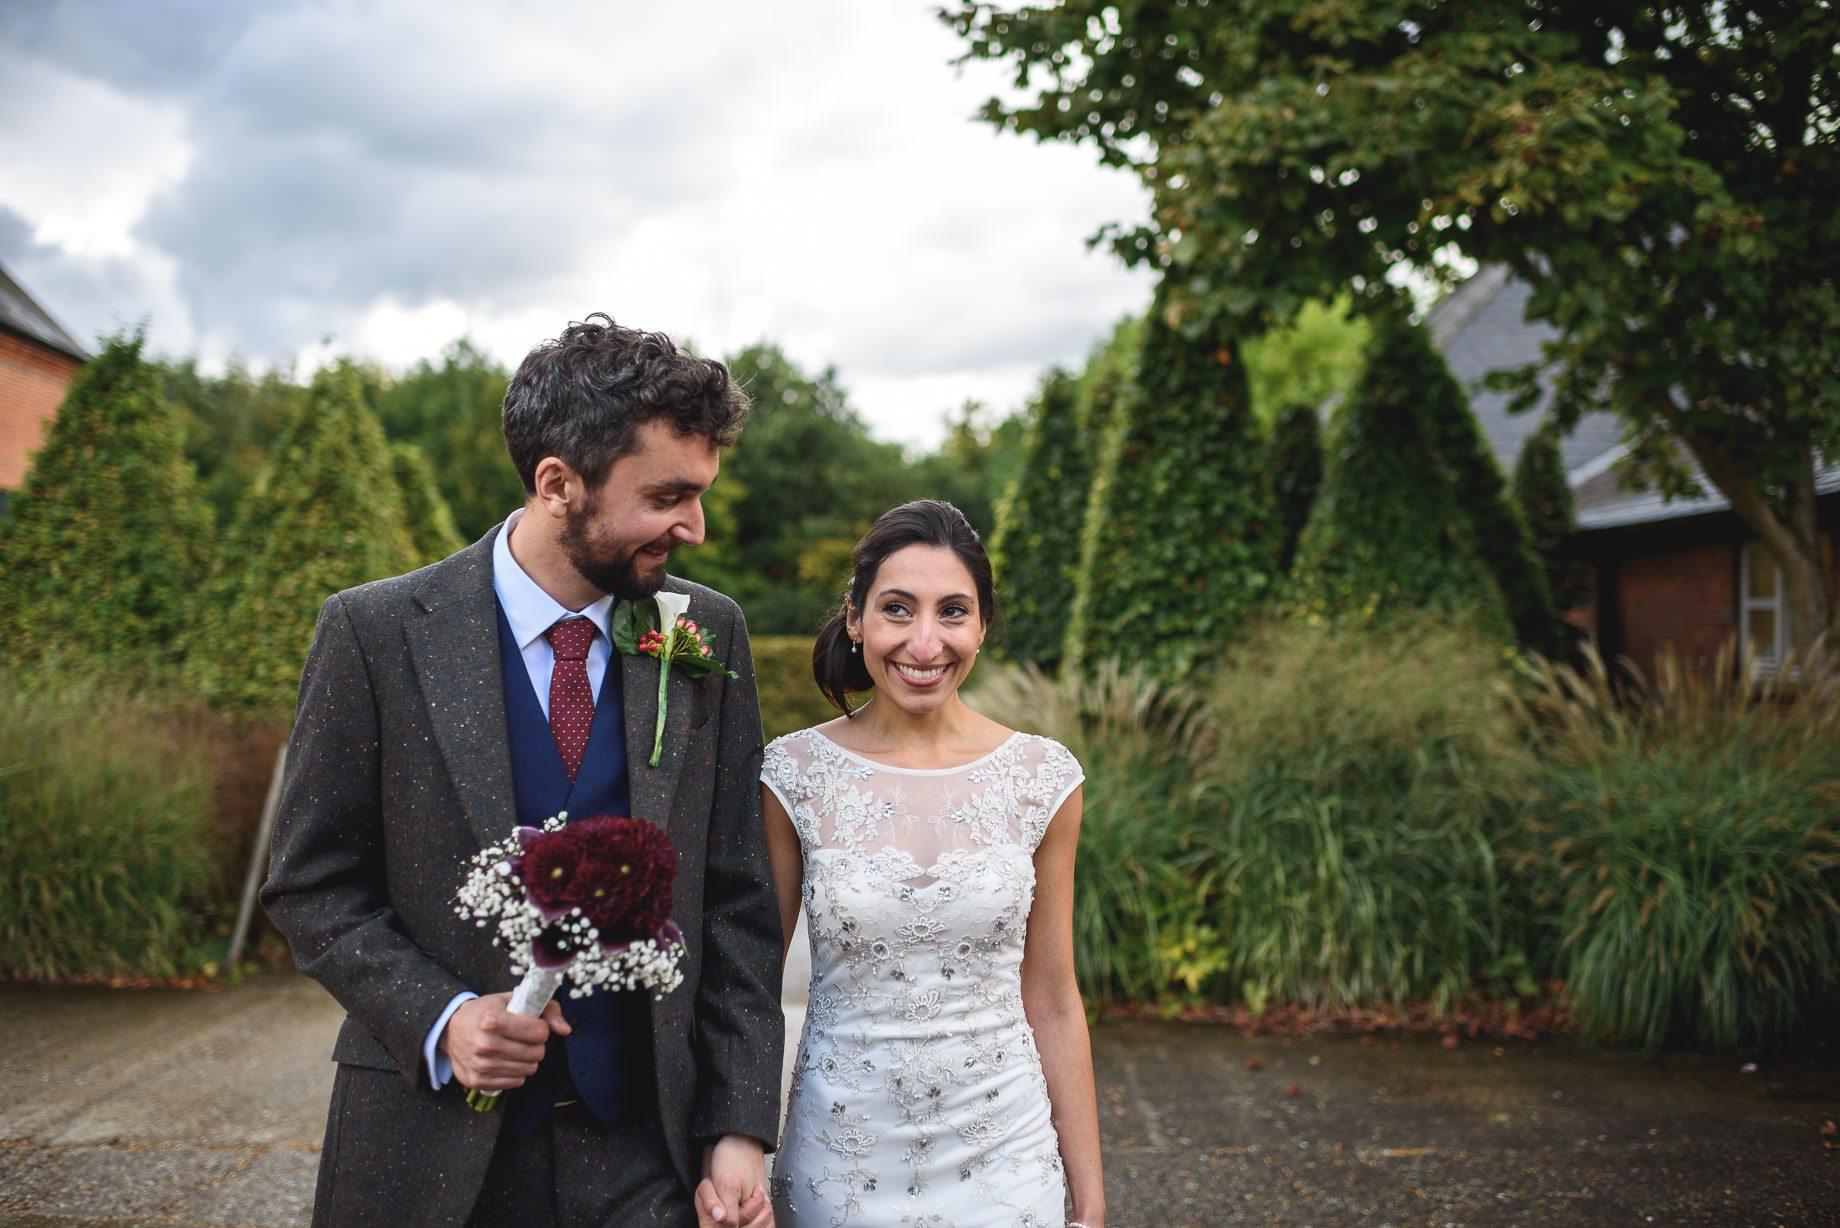 bury-court-barn-wedding-photography-guy-collier-photography-nadia-tom-72-of-184